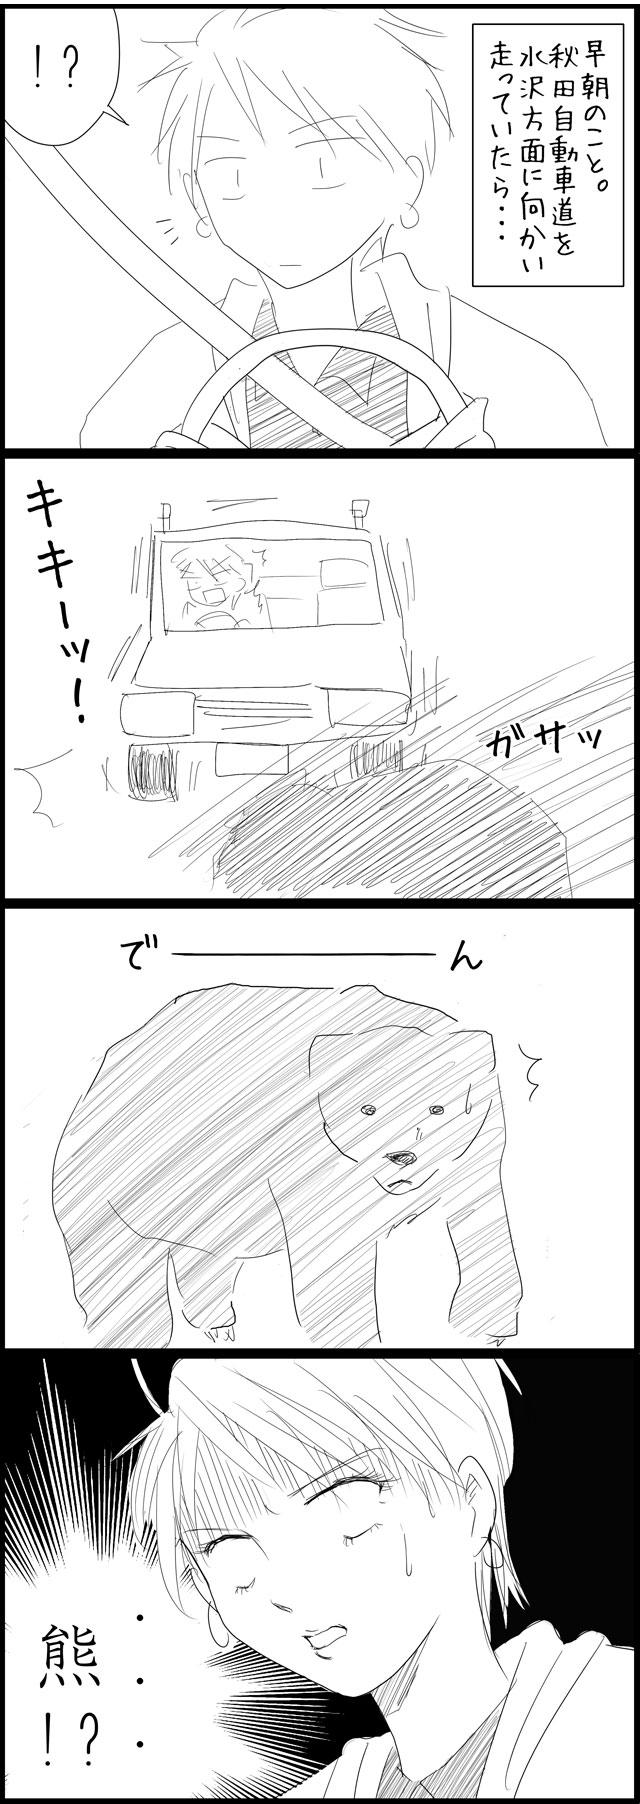 f:id:karutaru:20130930171402j:image:w480